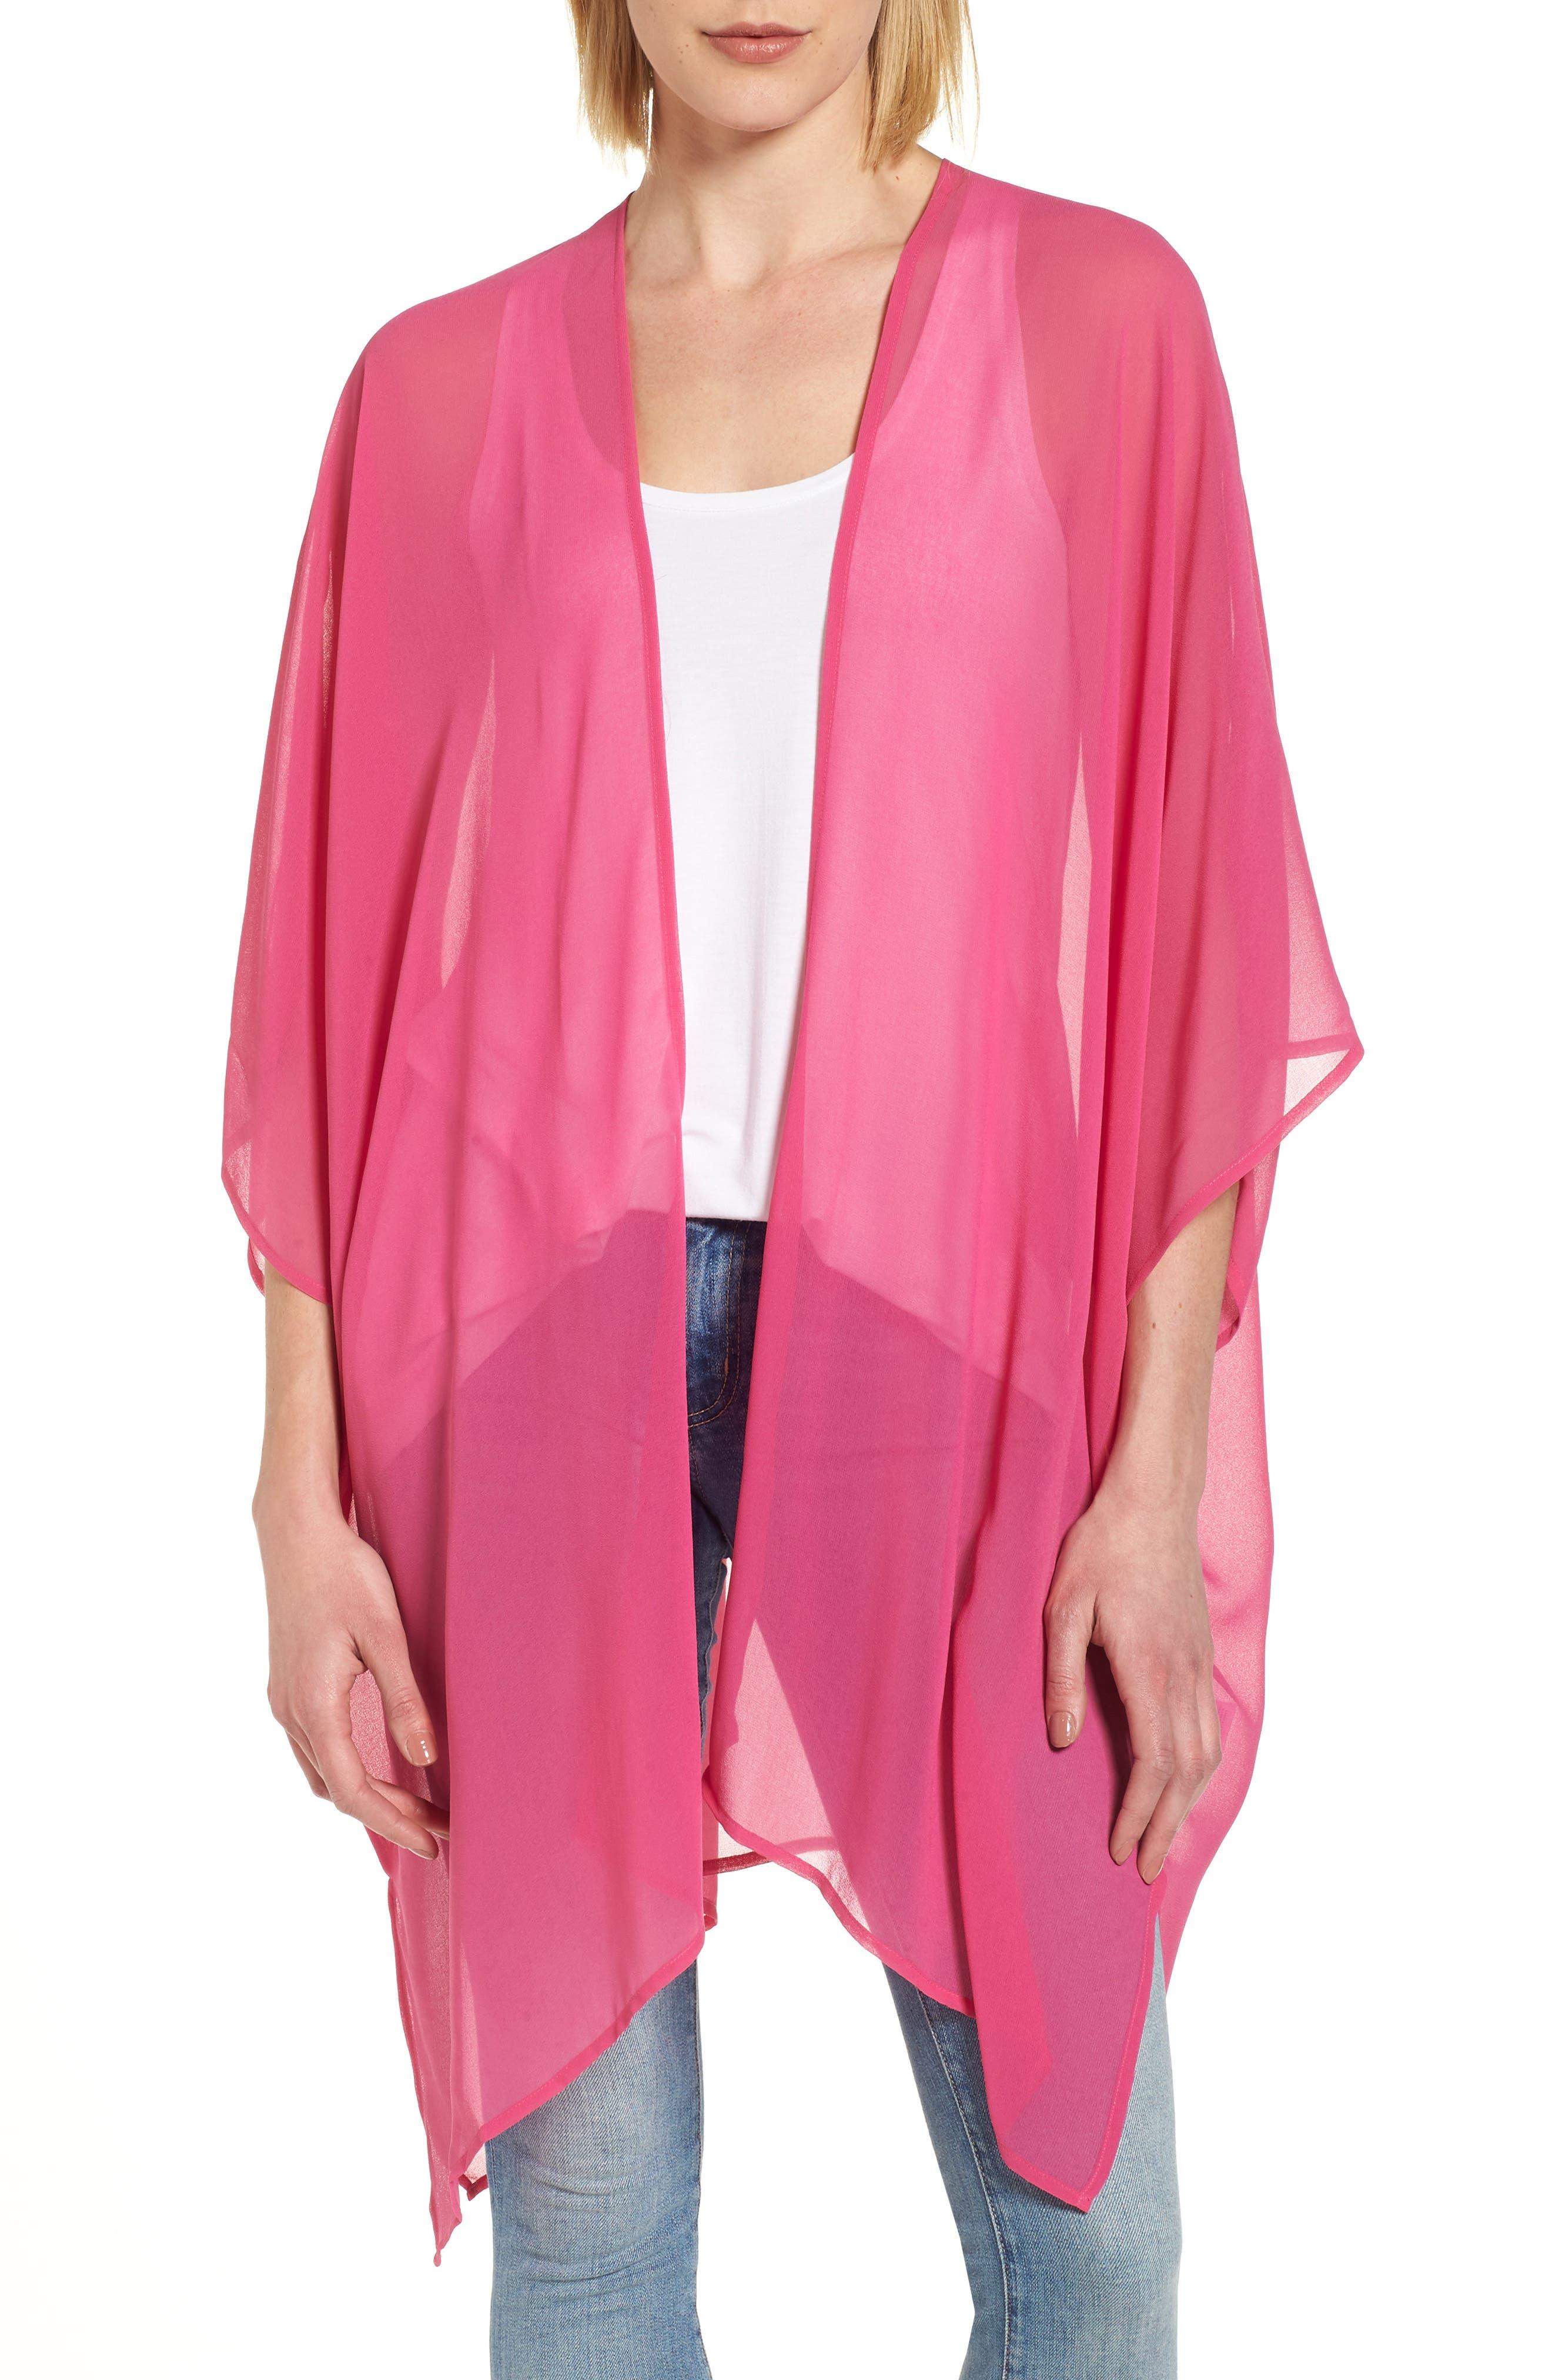 Alternate Image 1 Selected - Nordstrom Chiffon Cover-Up Kimono